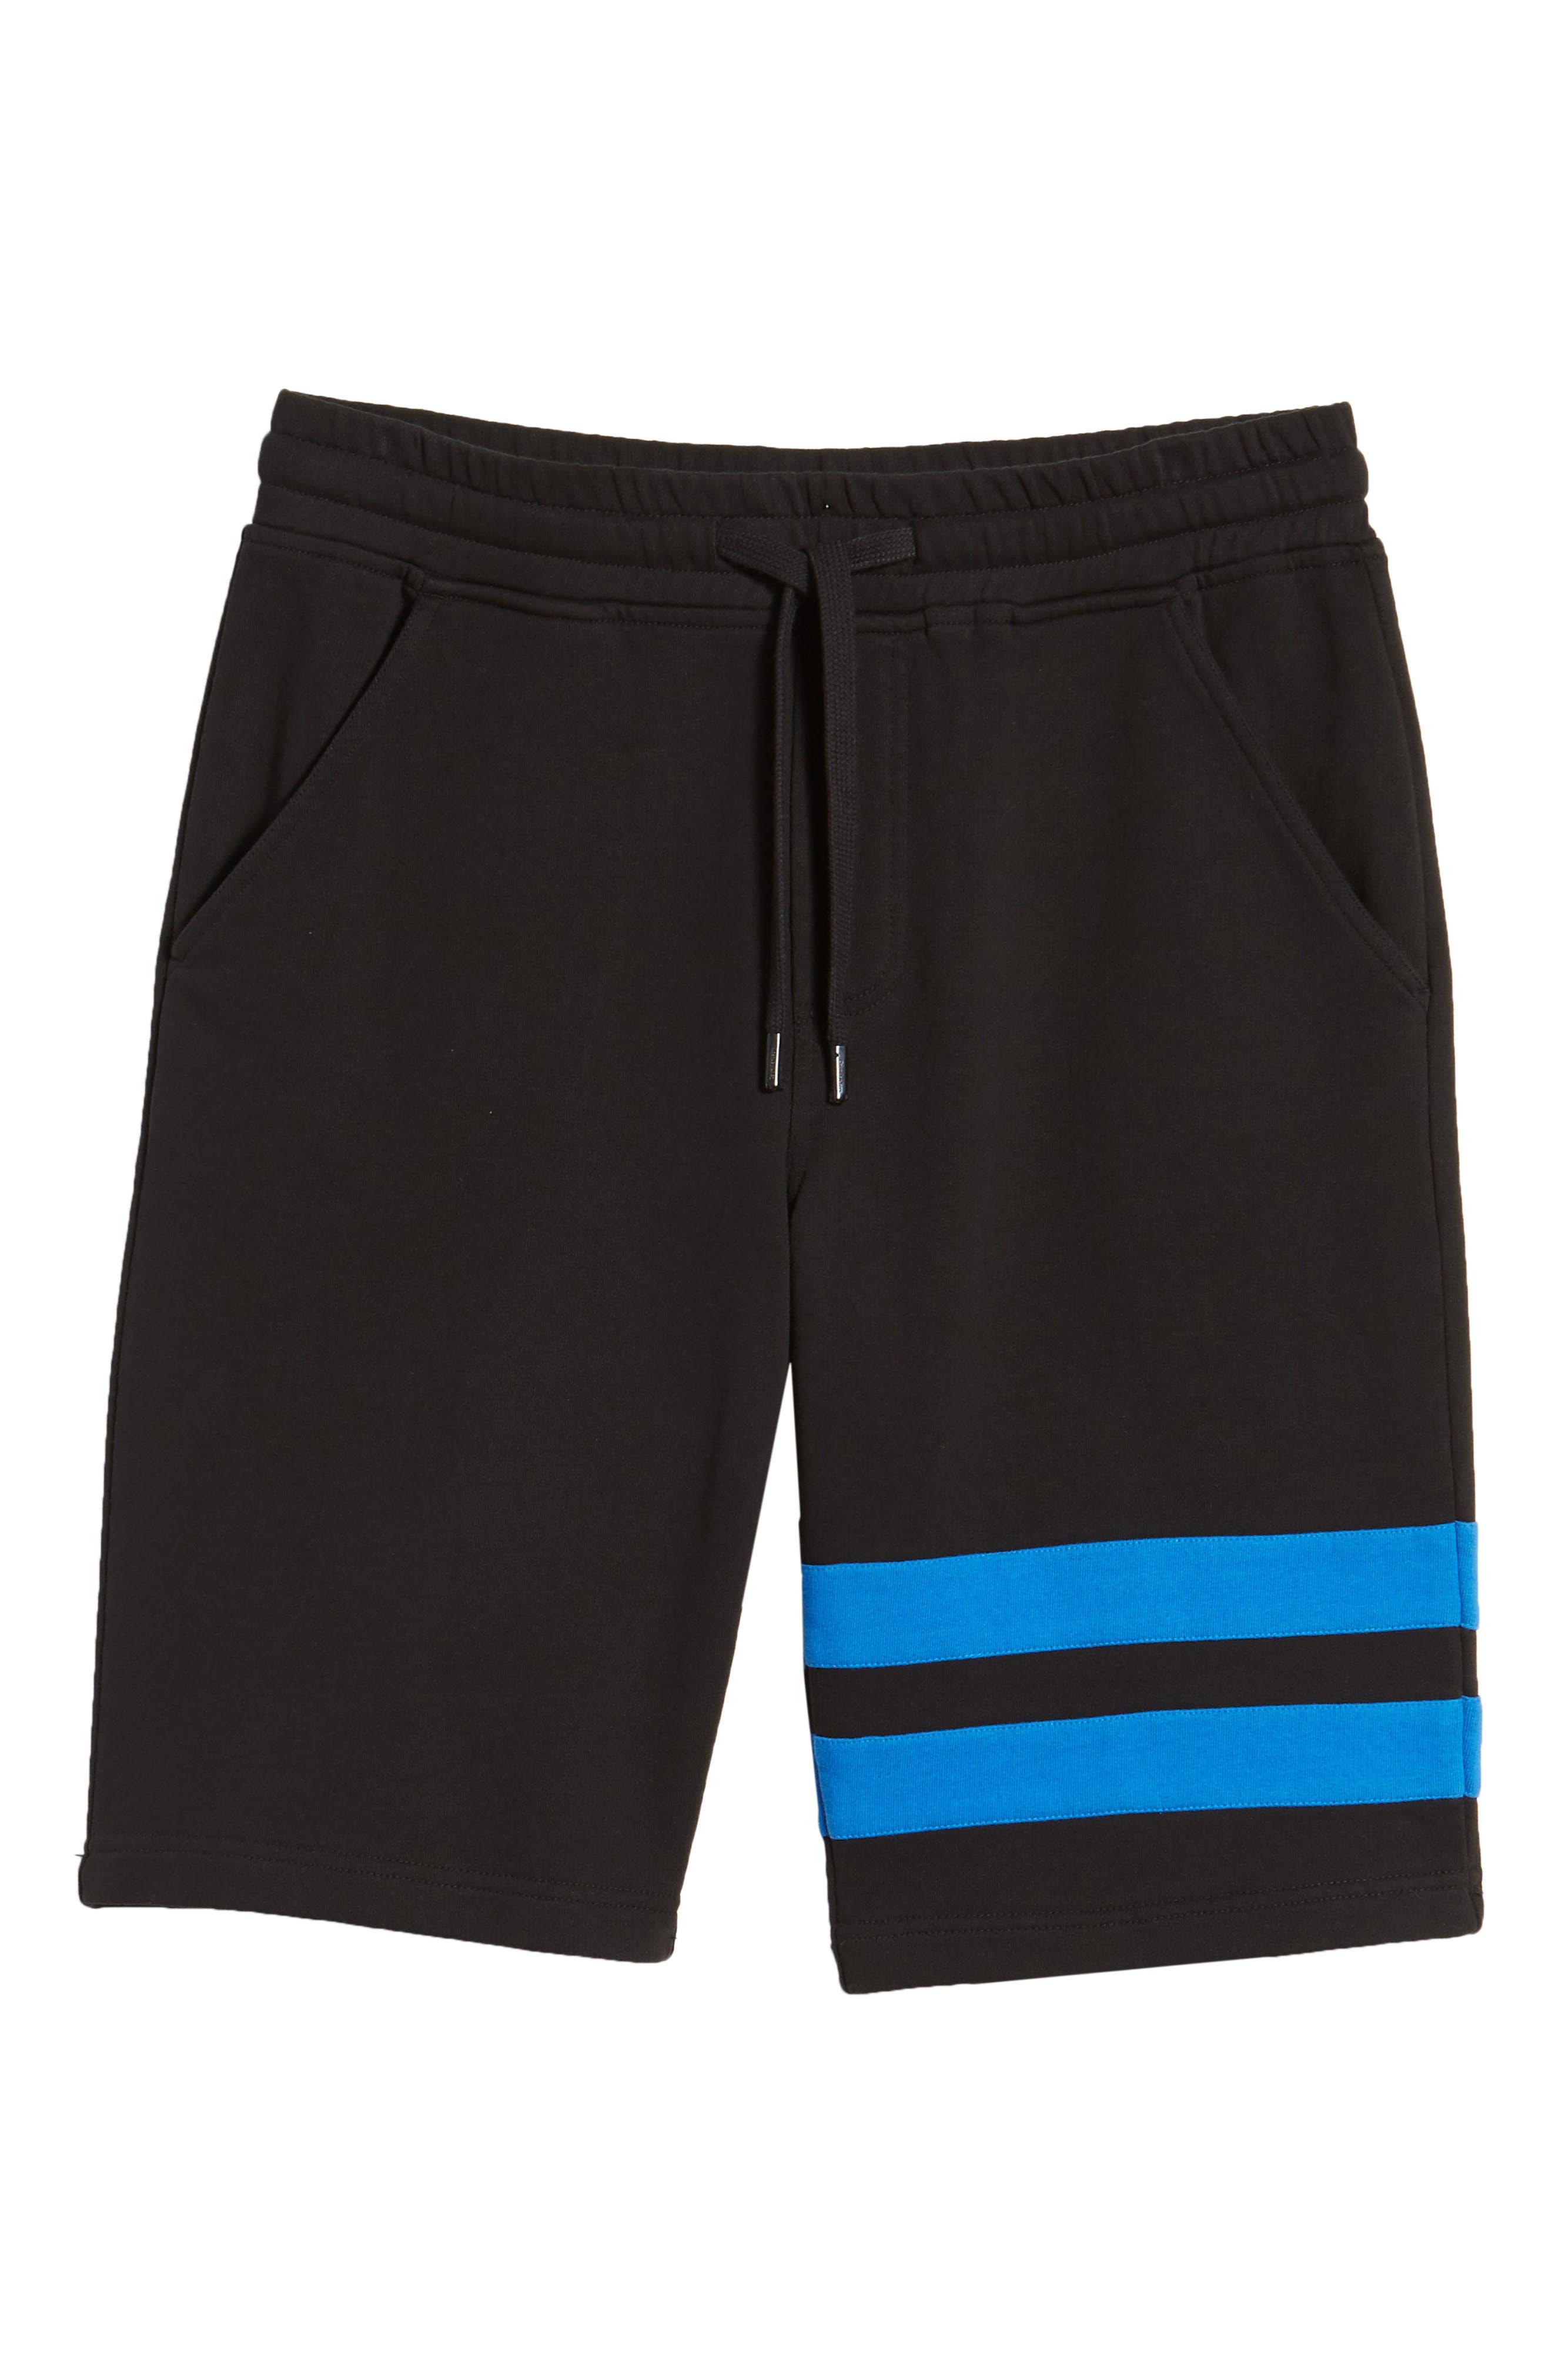 Stripe Athletic Shorts,                             Alternate thumbnail 6, color,                             010